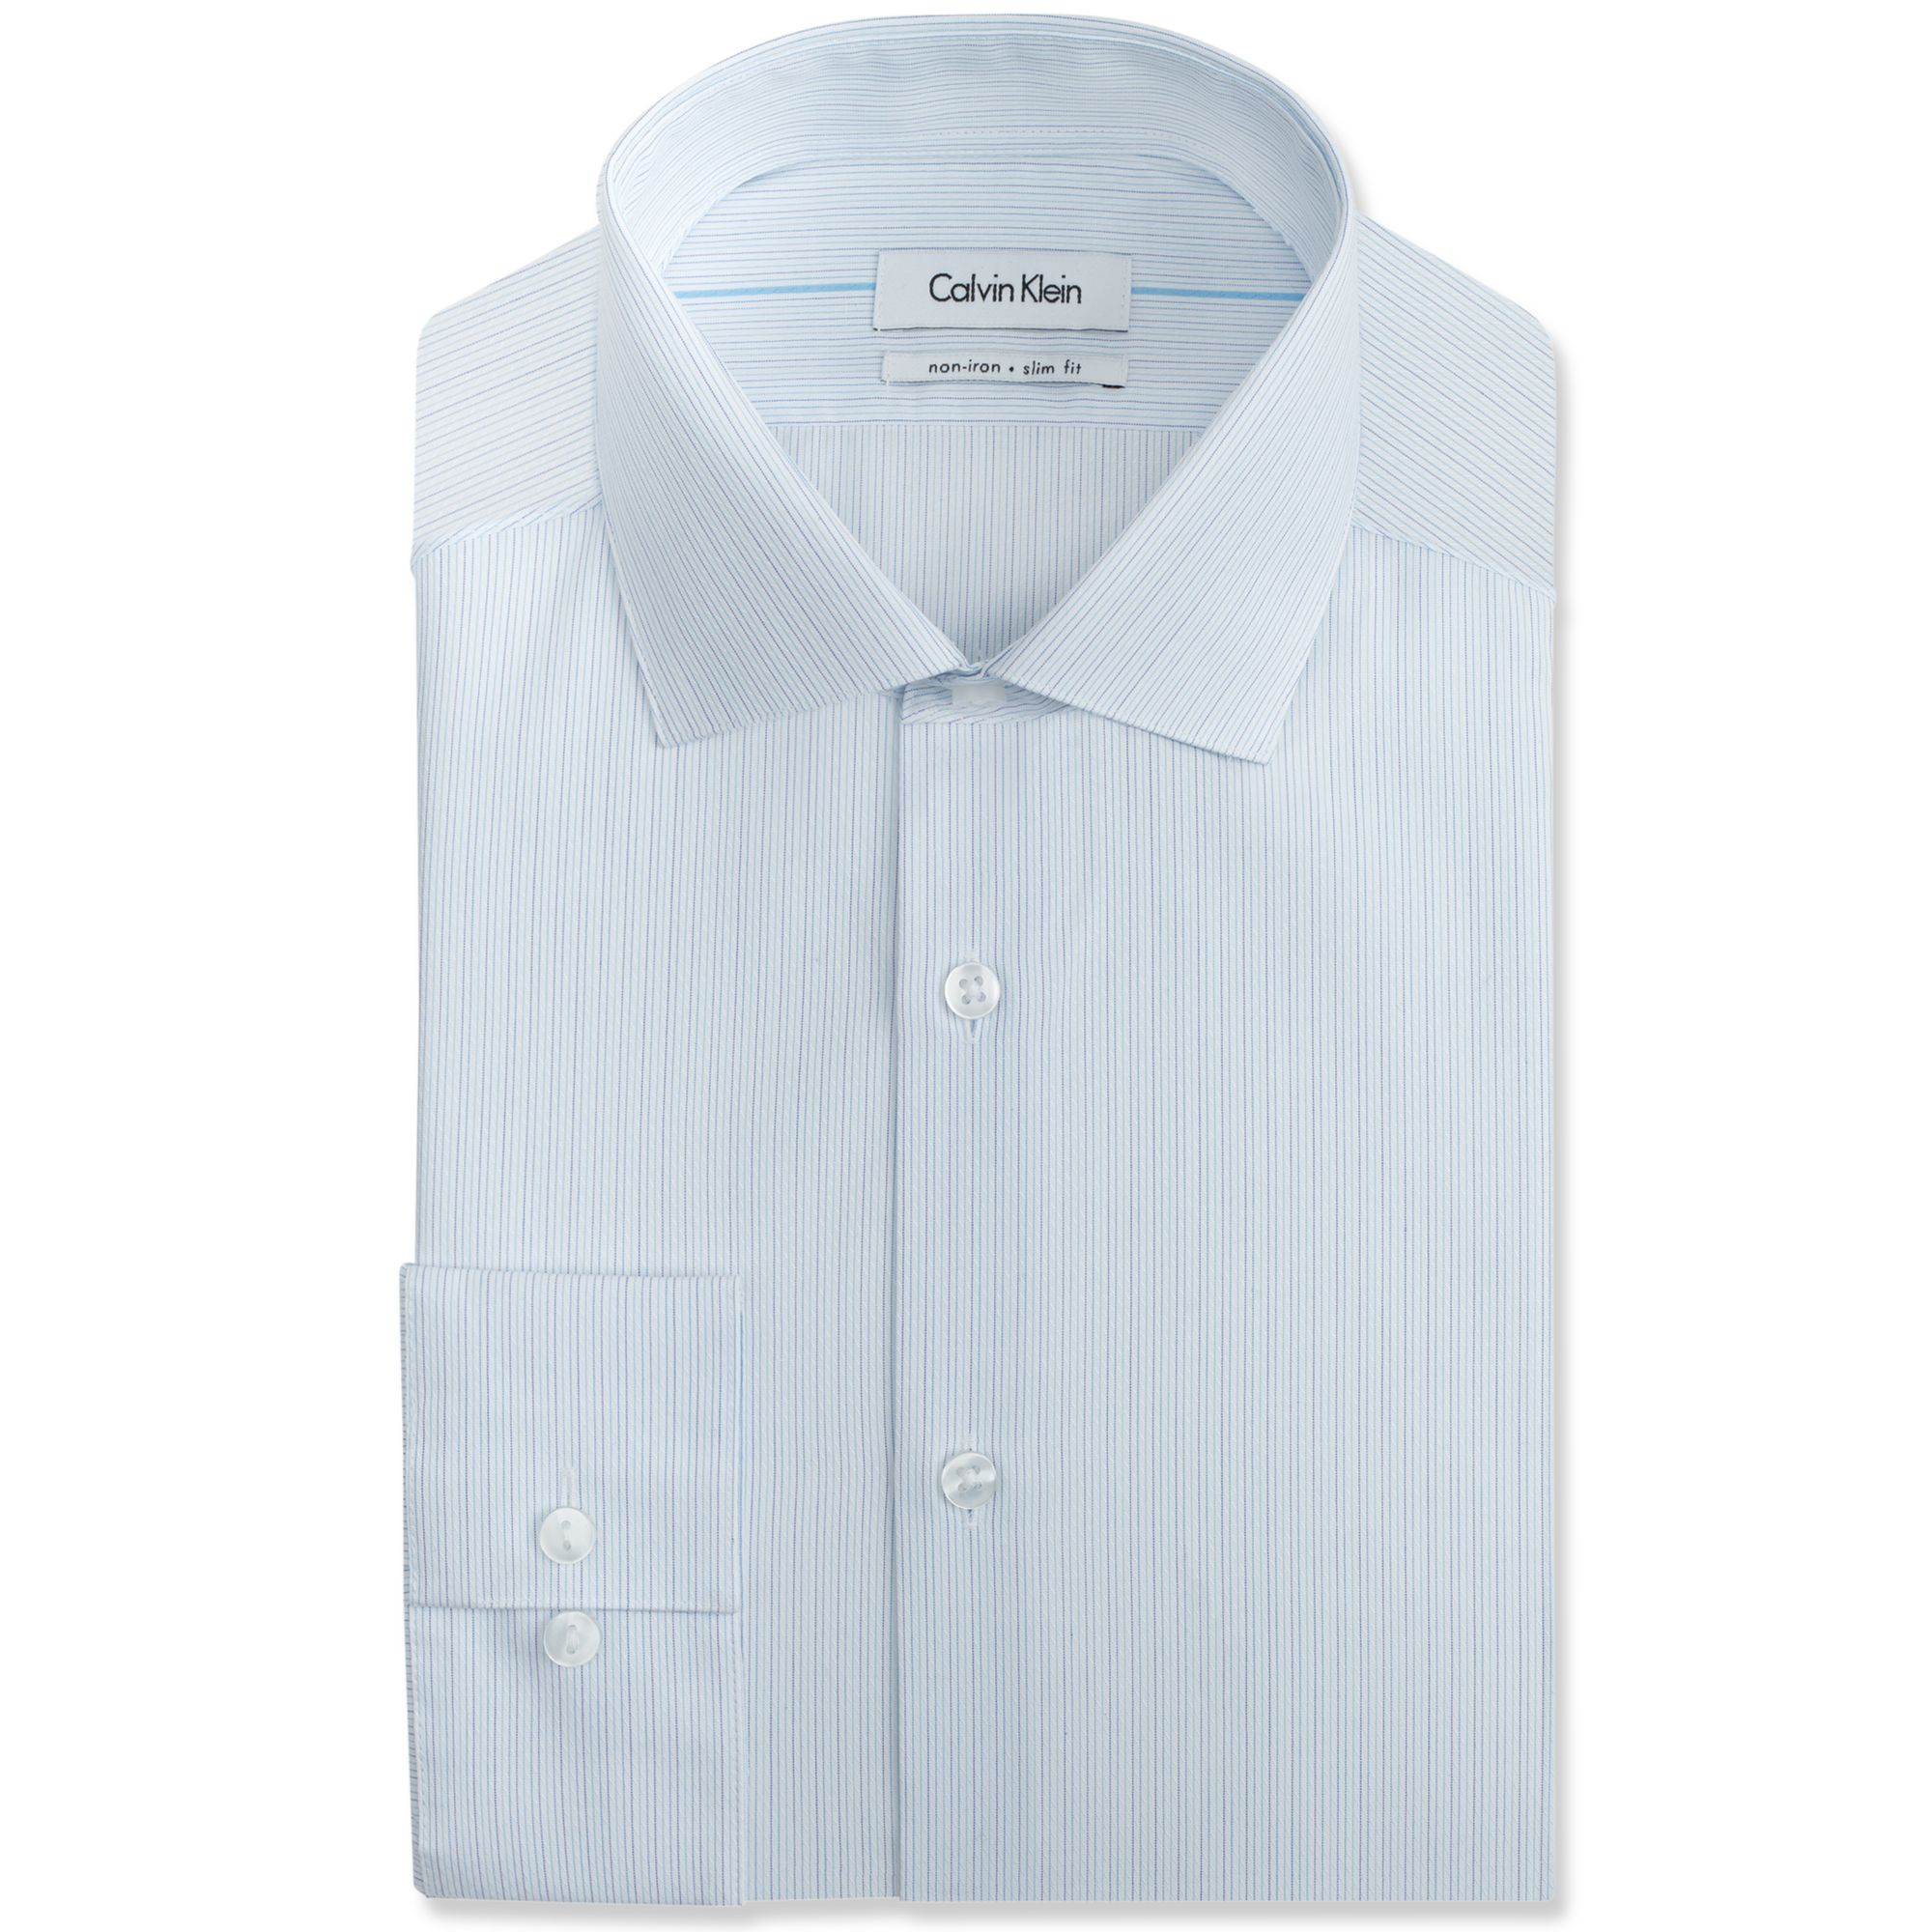 Calvin klein steel no iron white and blue stripe dress for No iron dress shirts for men